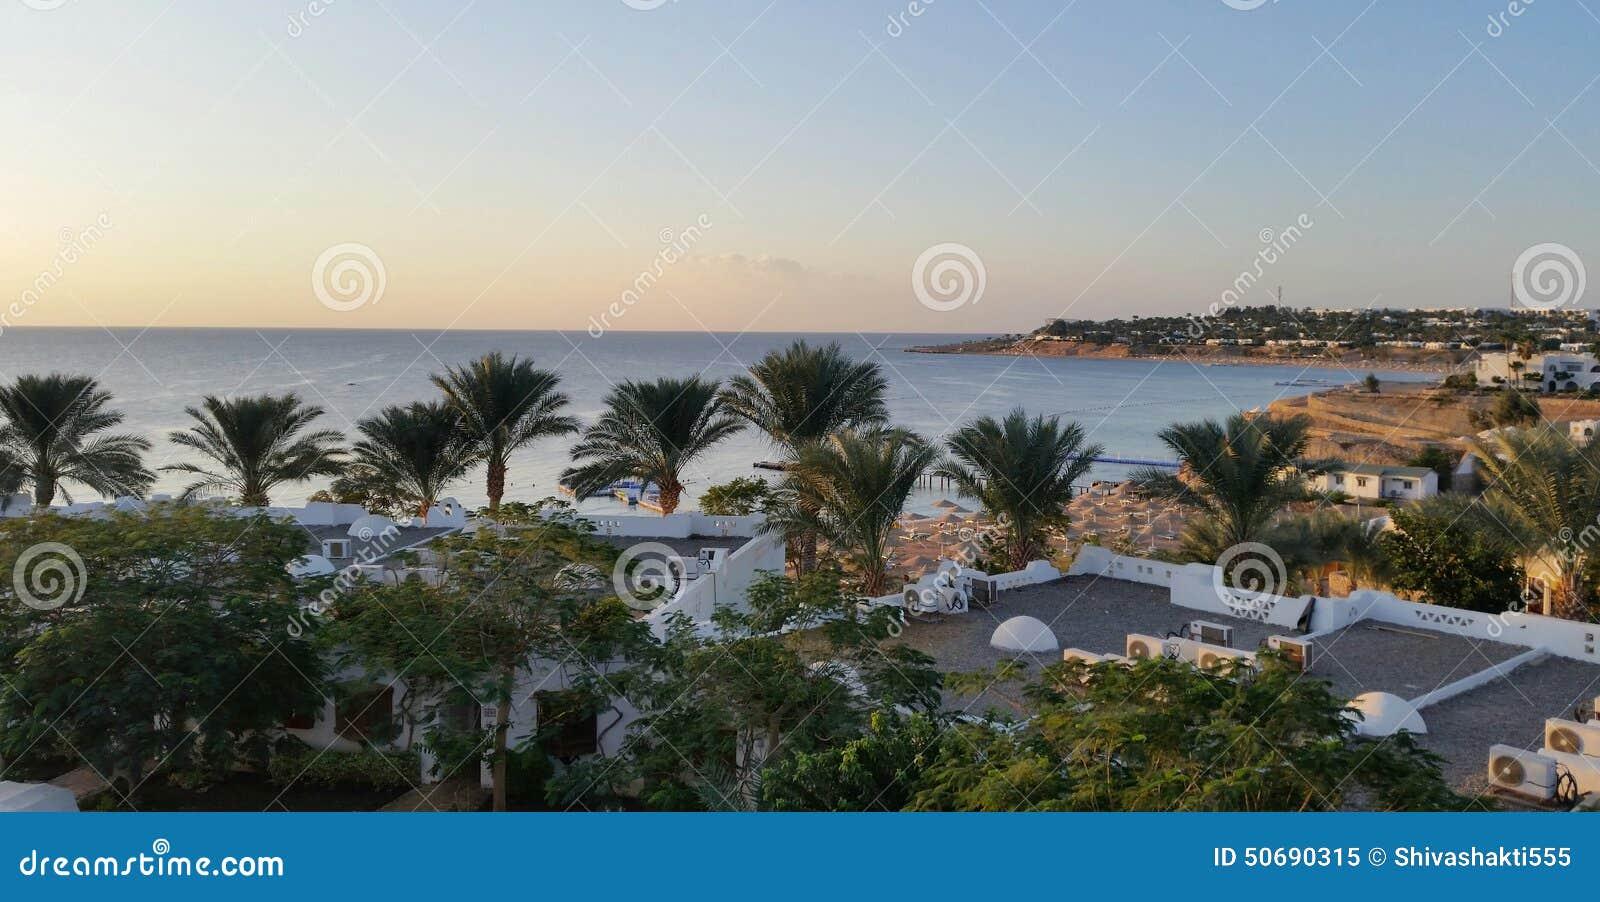 Download 在海滩的许多棕榈 库存图片. 图片 包括有 掌上型计算机, beauvoir, 背包徒步旅行者, 女演员 - 50690315